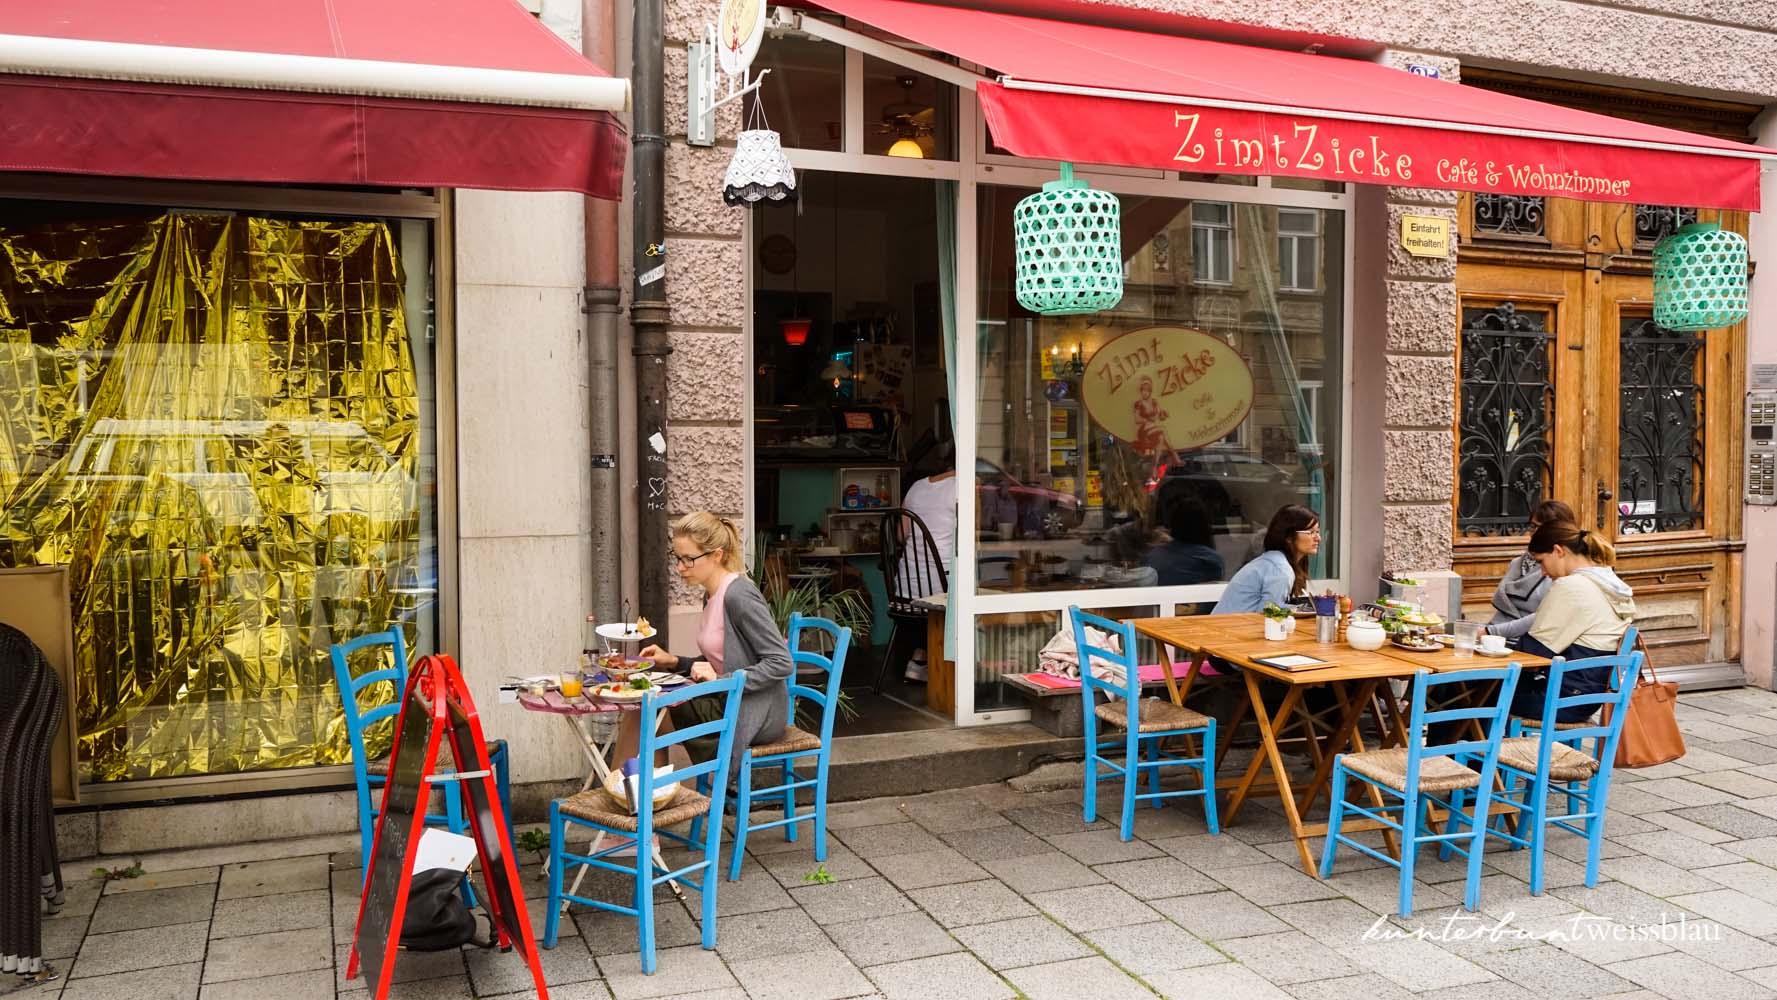 Fruhstuck Im Cafe Zimtzicke Munchen Kunterbuntweissblau I